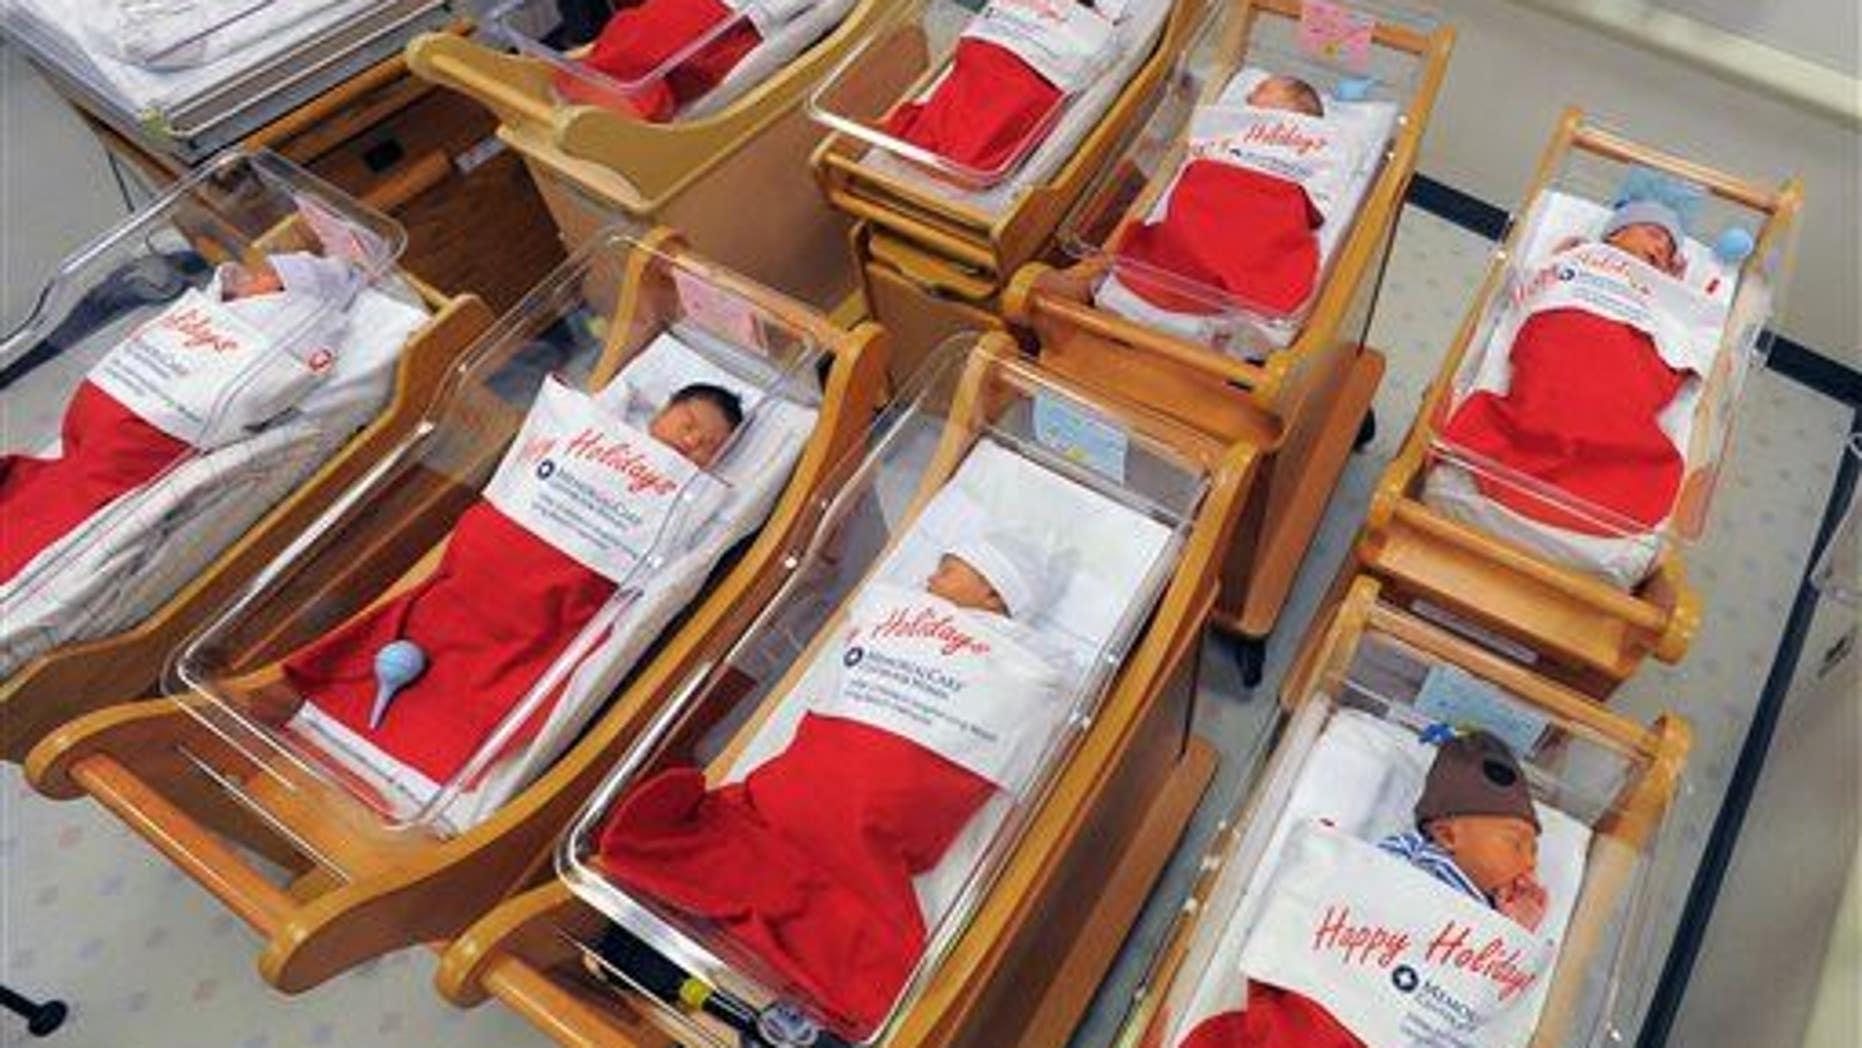 Newborns sleep in oversized red stockings in the nursery at Long Beach Memorial in Long Beach, Calif., on Monday, Dec. 23, 2013.